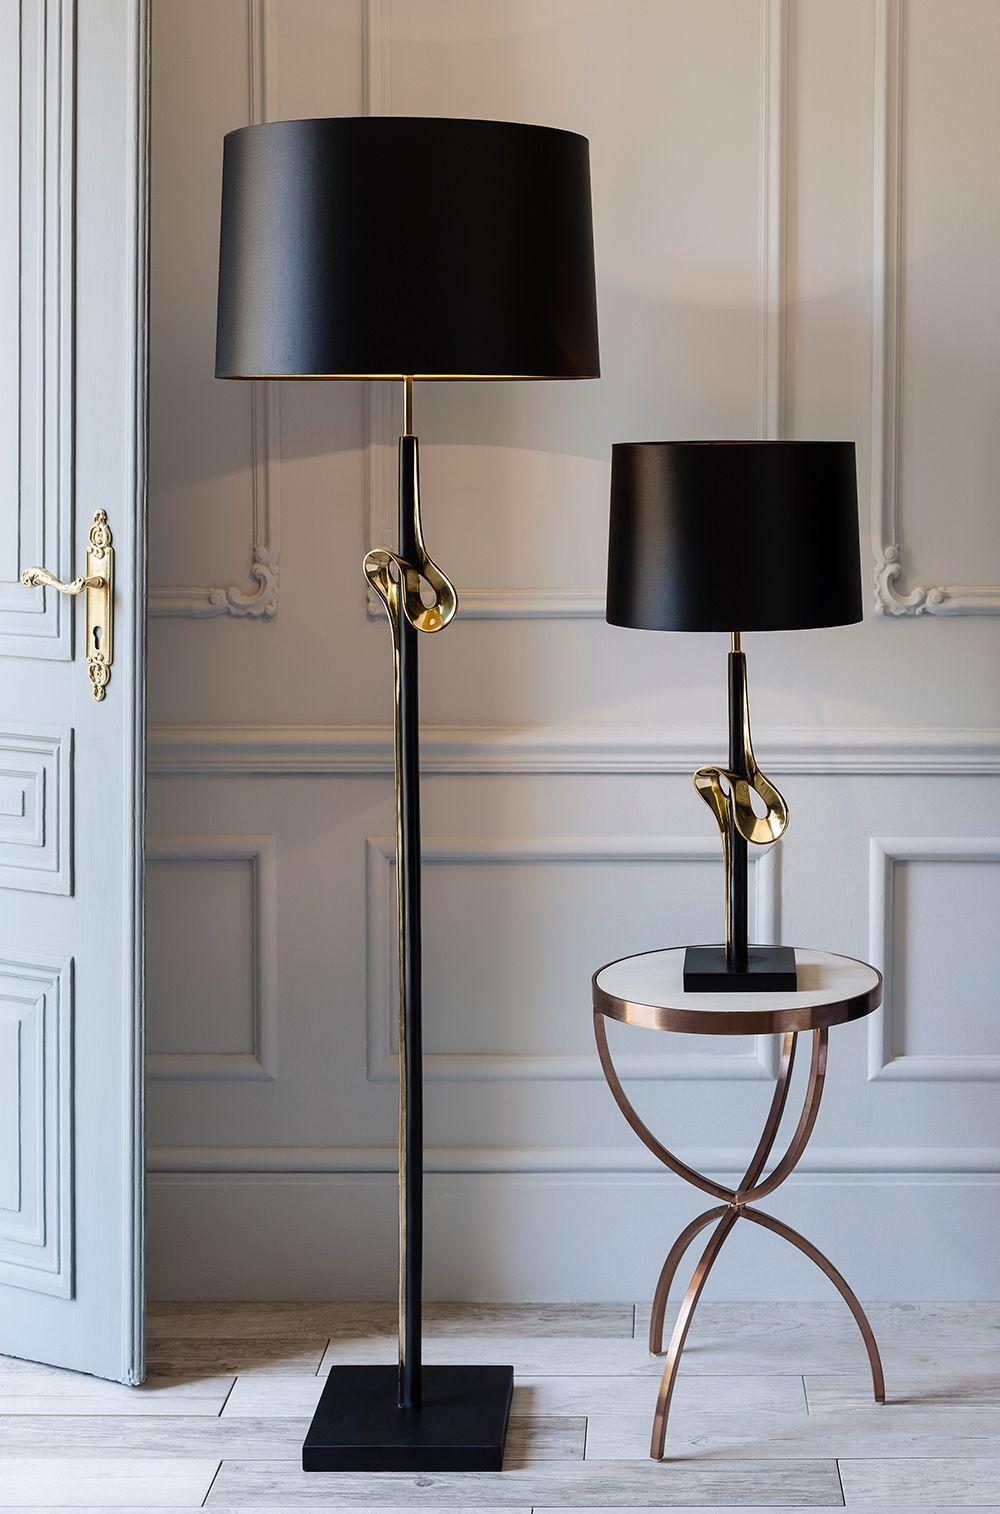 The Floor Lamps Ideas For Your Decor Wishes Http Modernfloorlamps Net Unique Floor Lamps Lamps Living Room Black Floor Lamp